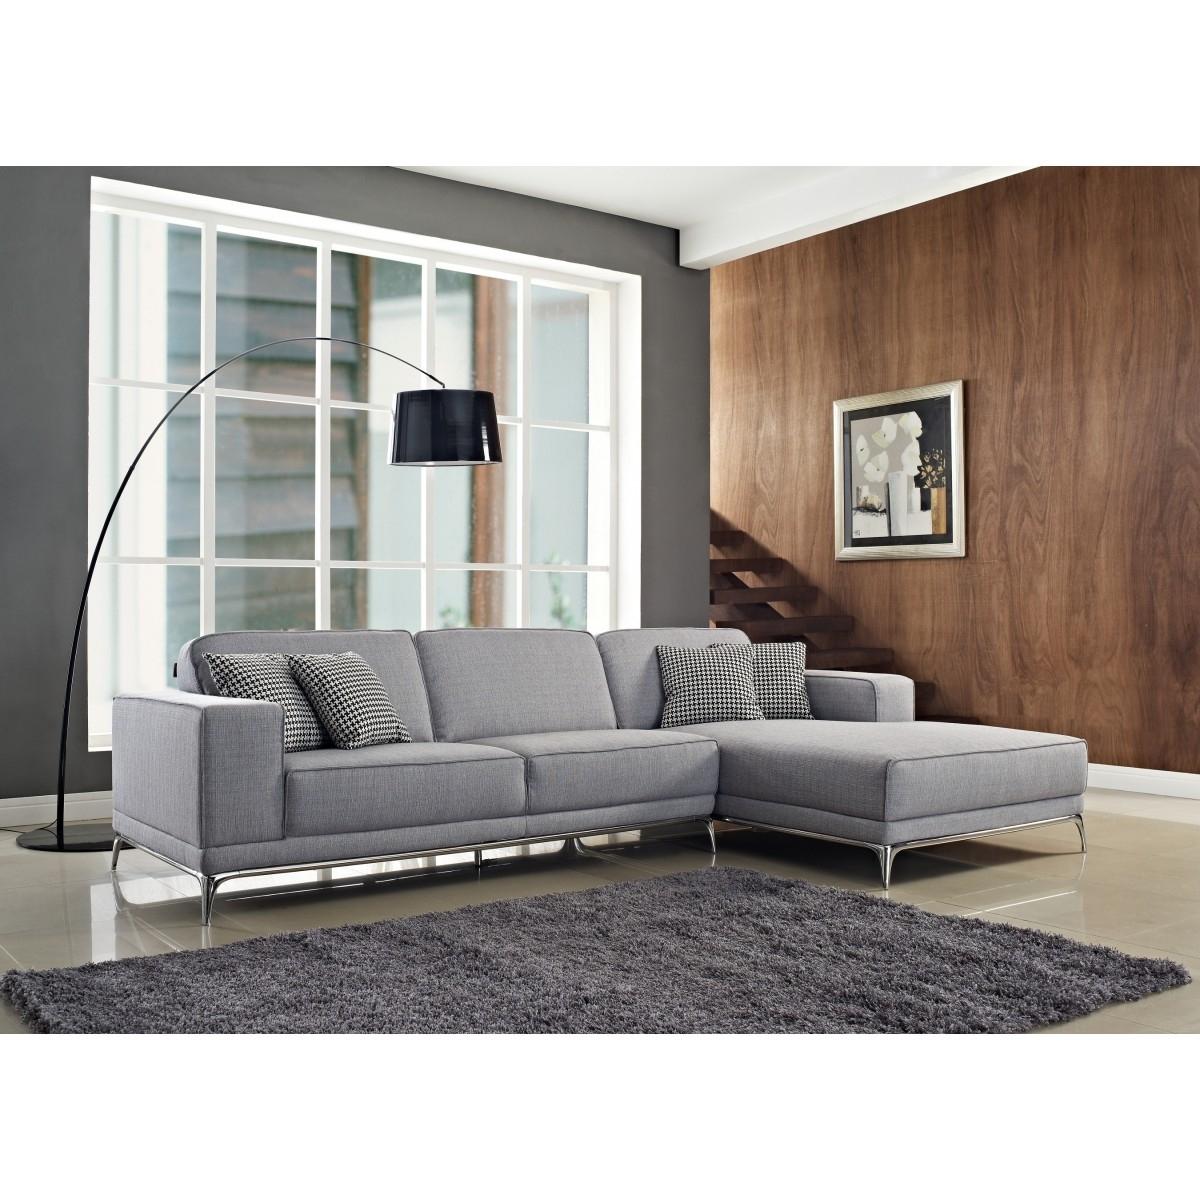 Agata Sectional Sofa | Light Grey | Sectional Sofas Cr Agata In Light Grey Sectional Sofas (Image 2 of 10)